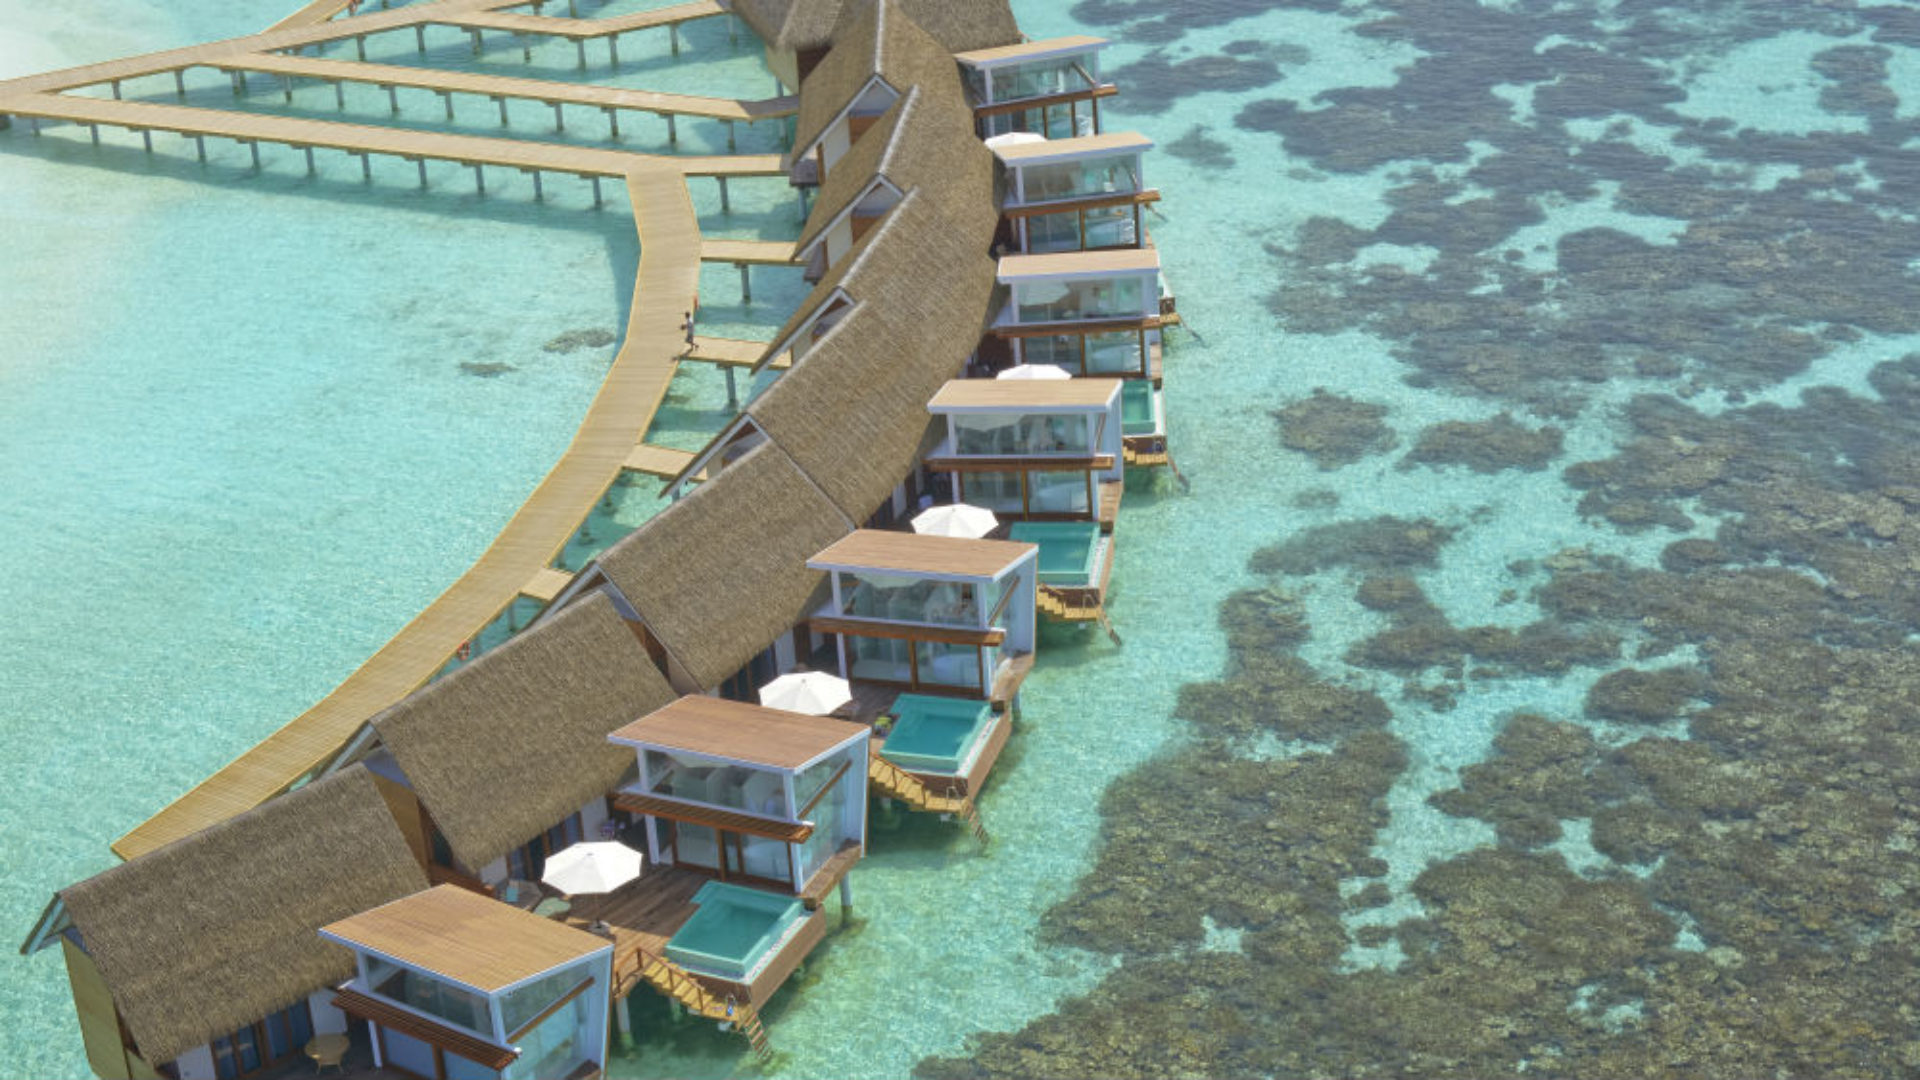 Aerial view of the overwater villas at Kandolhu Resort